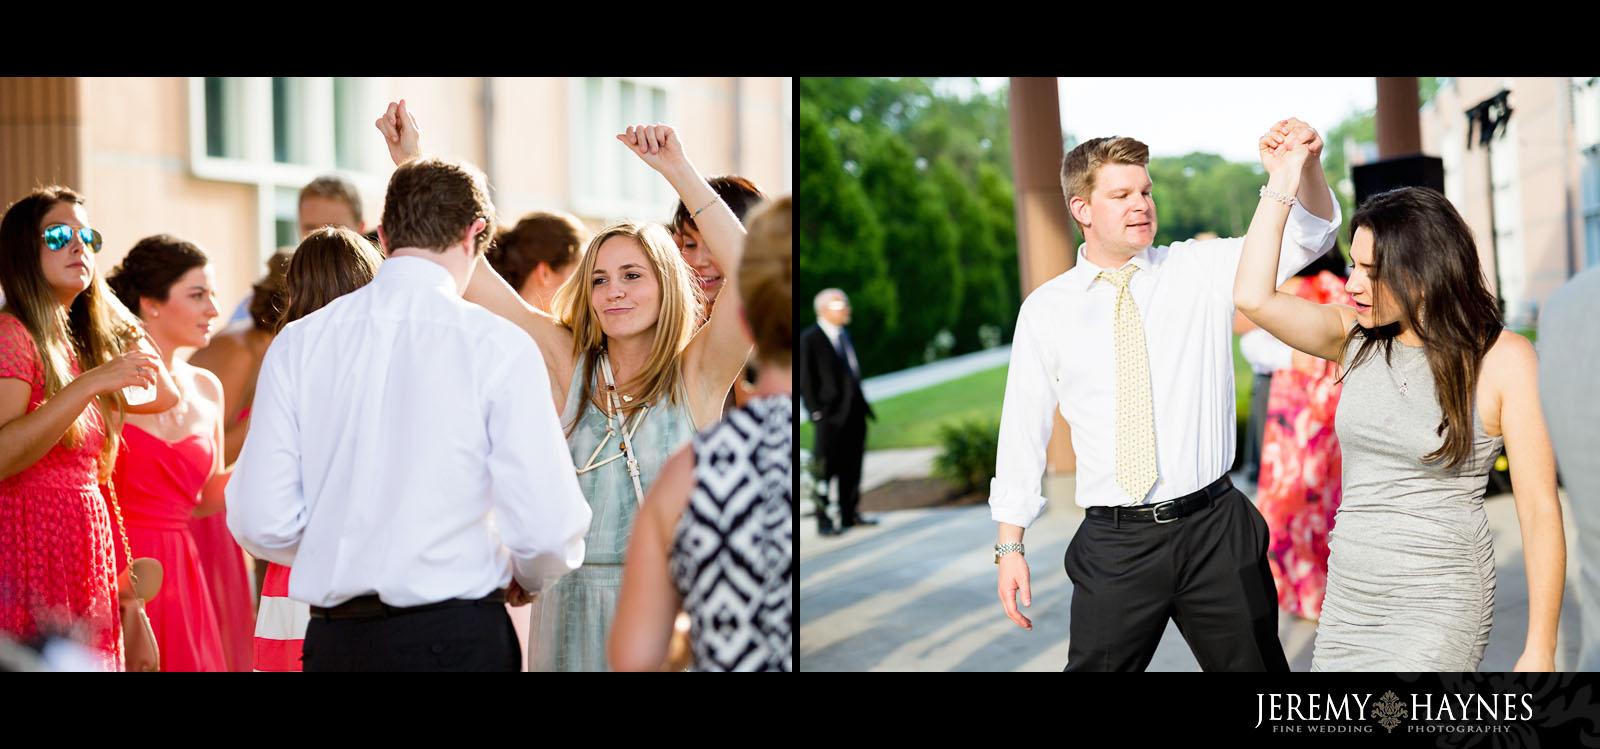 42 Indianapolis Art Center Indianapolis, IN Wedding Candid Dance Photos.jpg